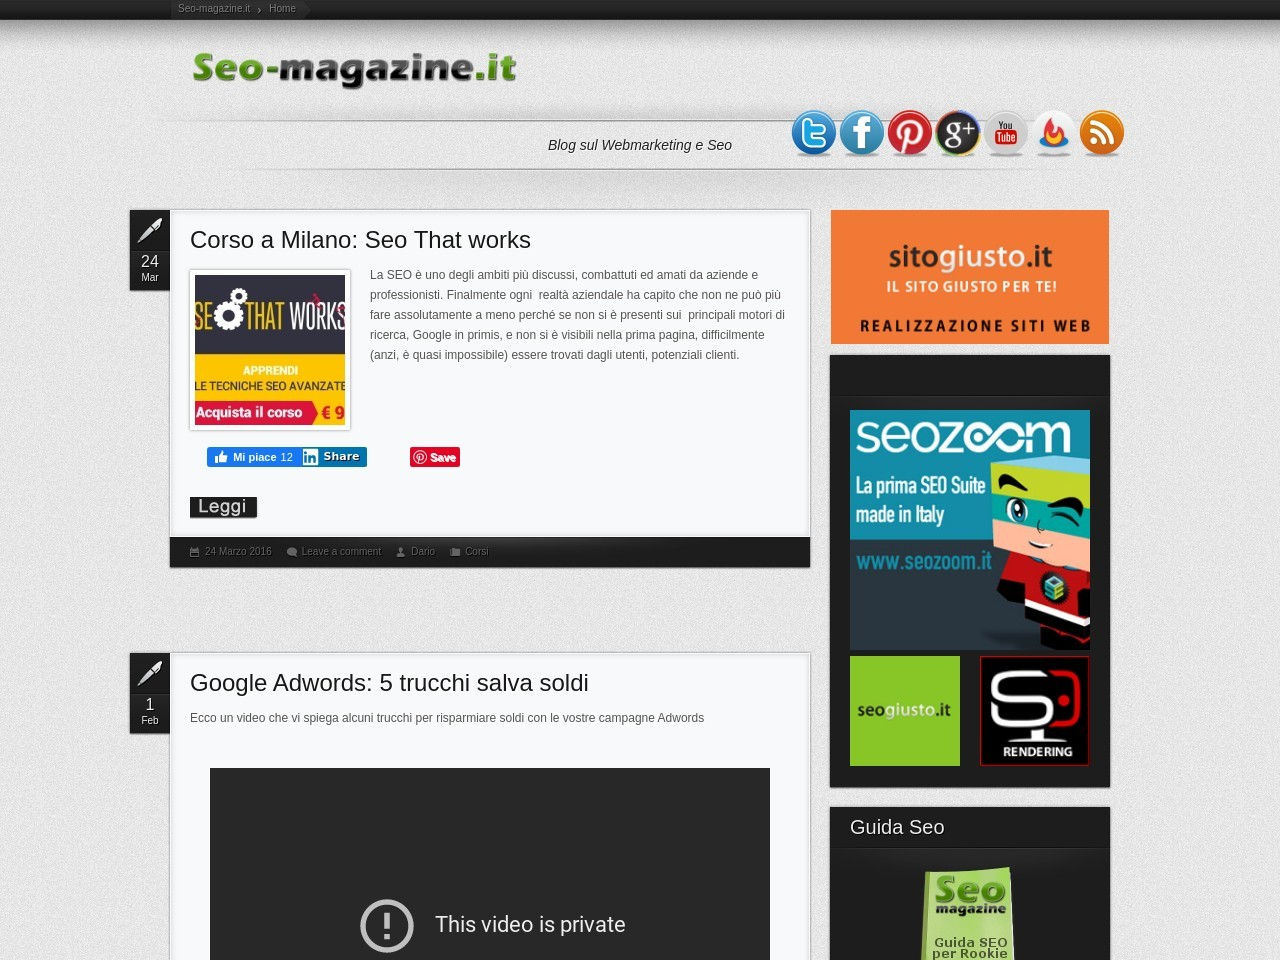 seo-magazine